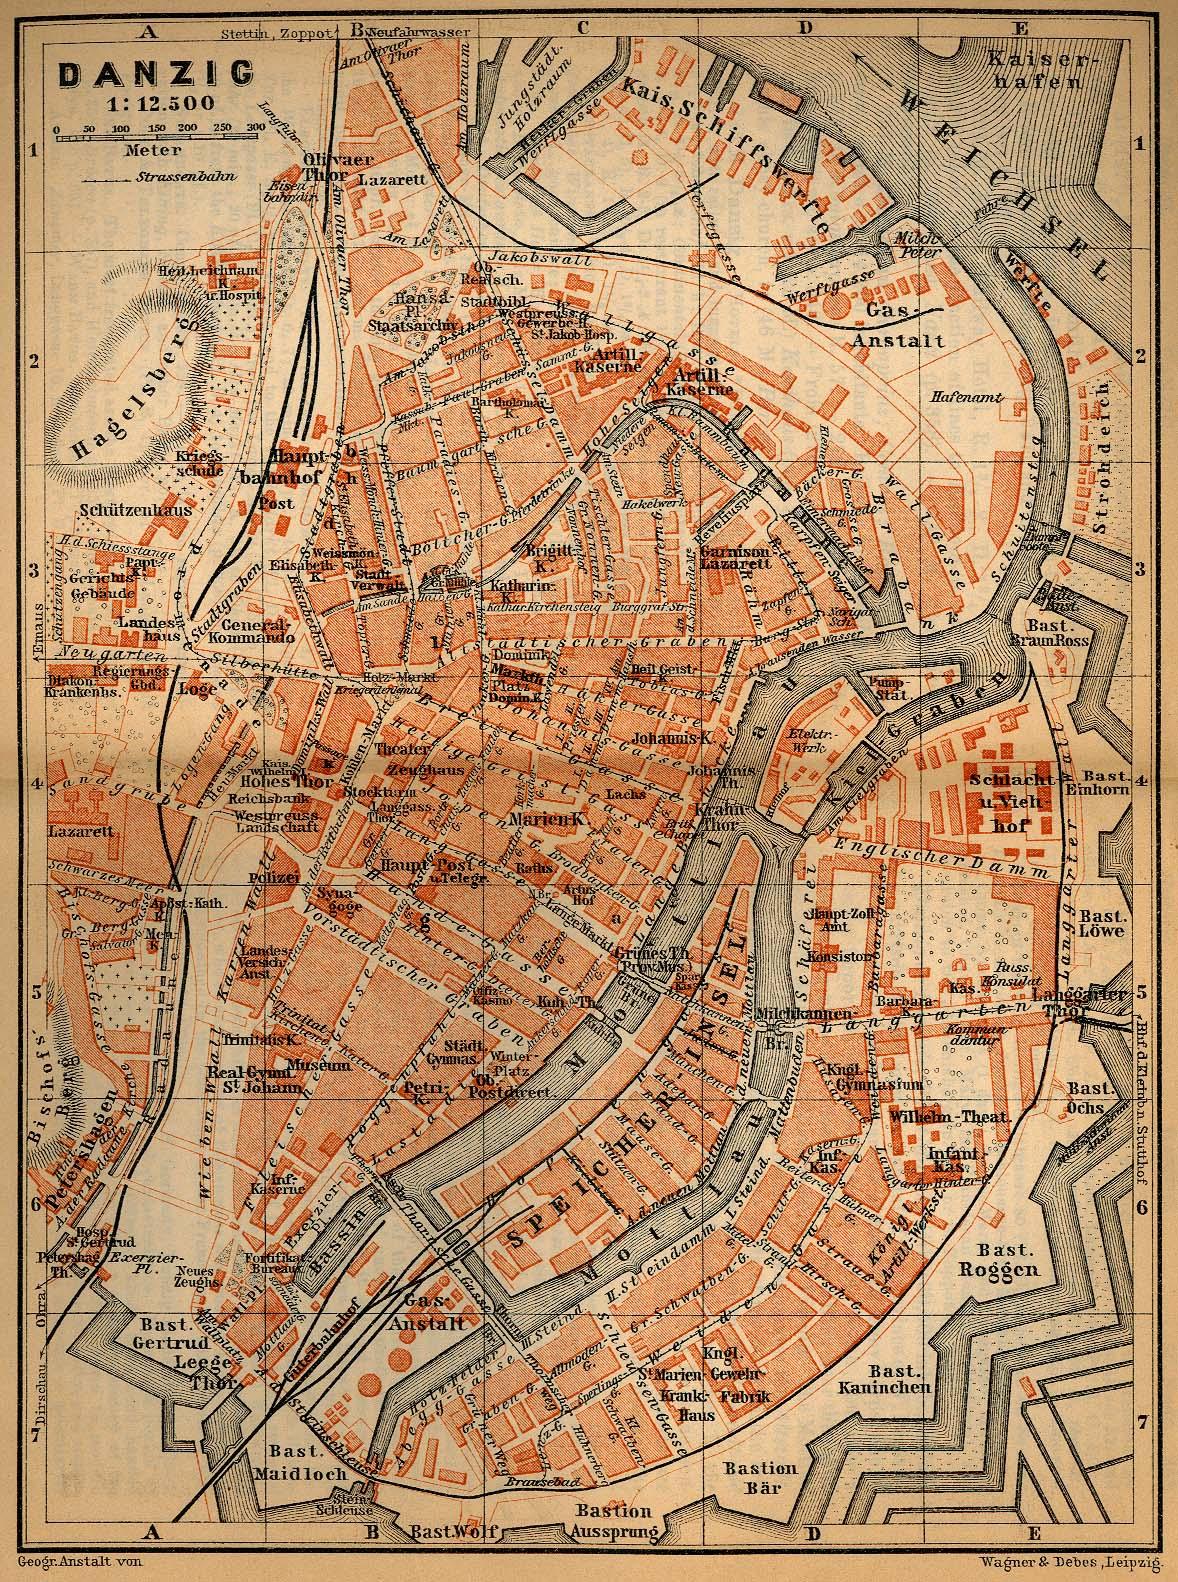 Danzig Mapa histórico, Alemania 1910.